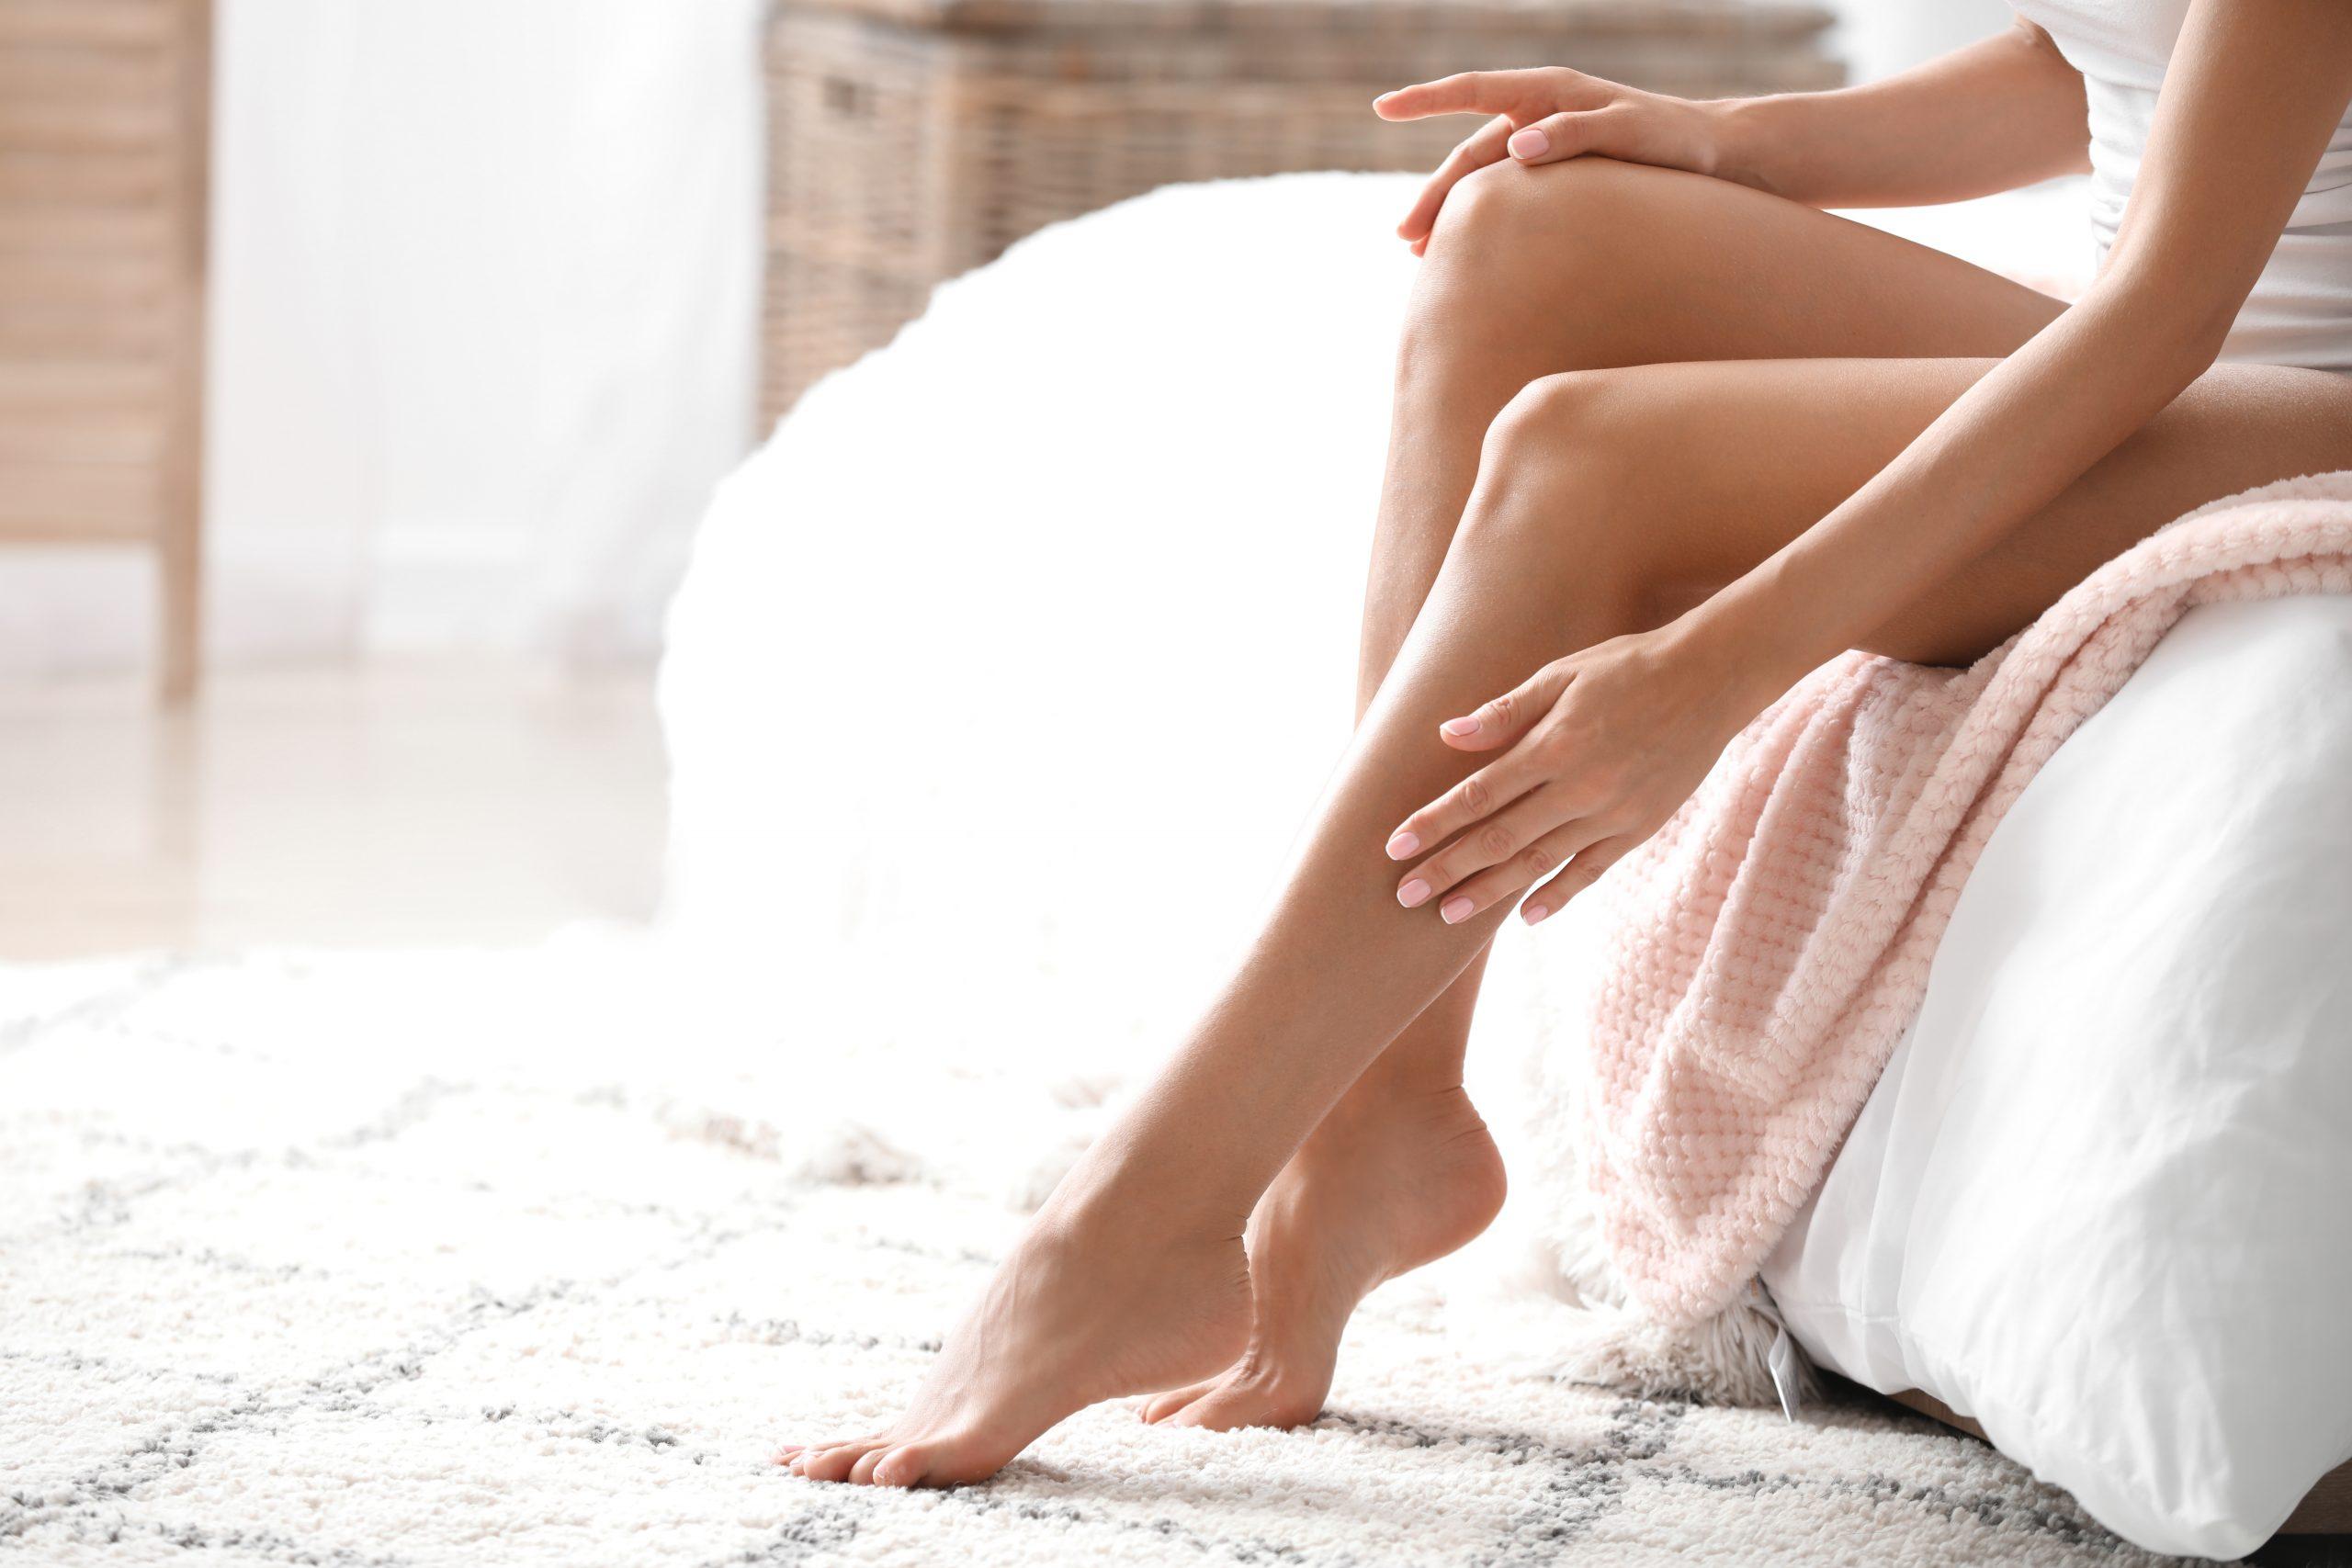 vartalon hoito kuivaharjaus